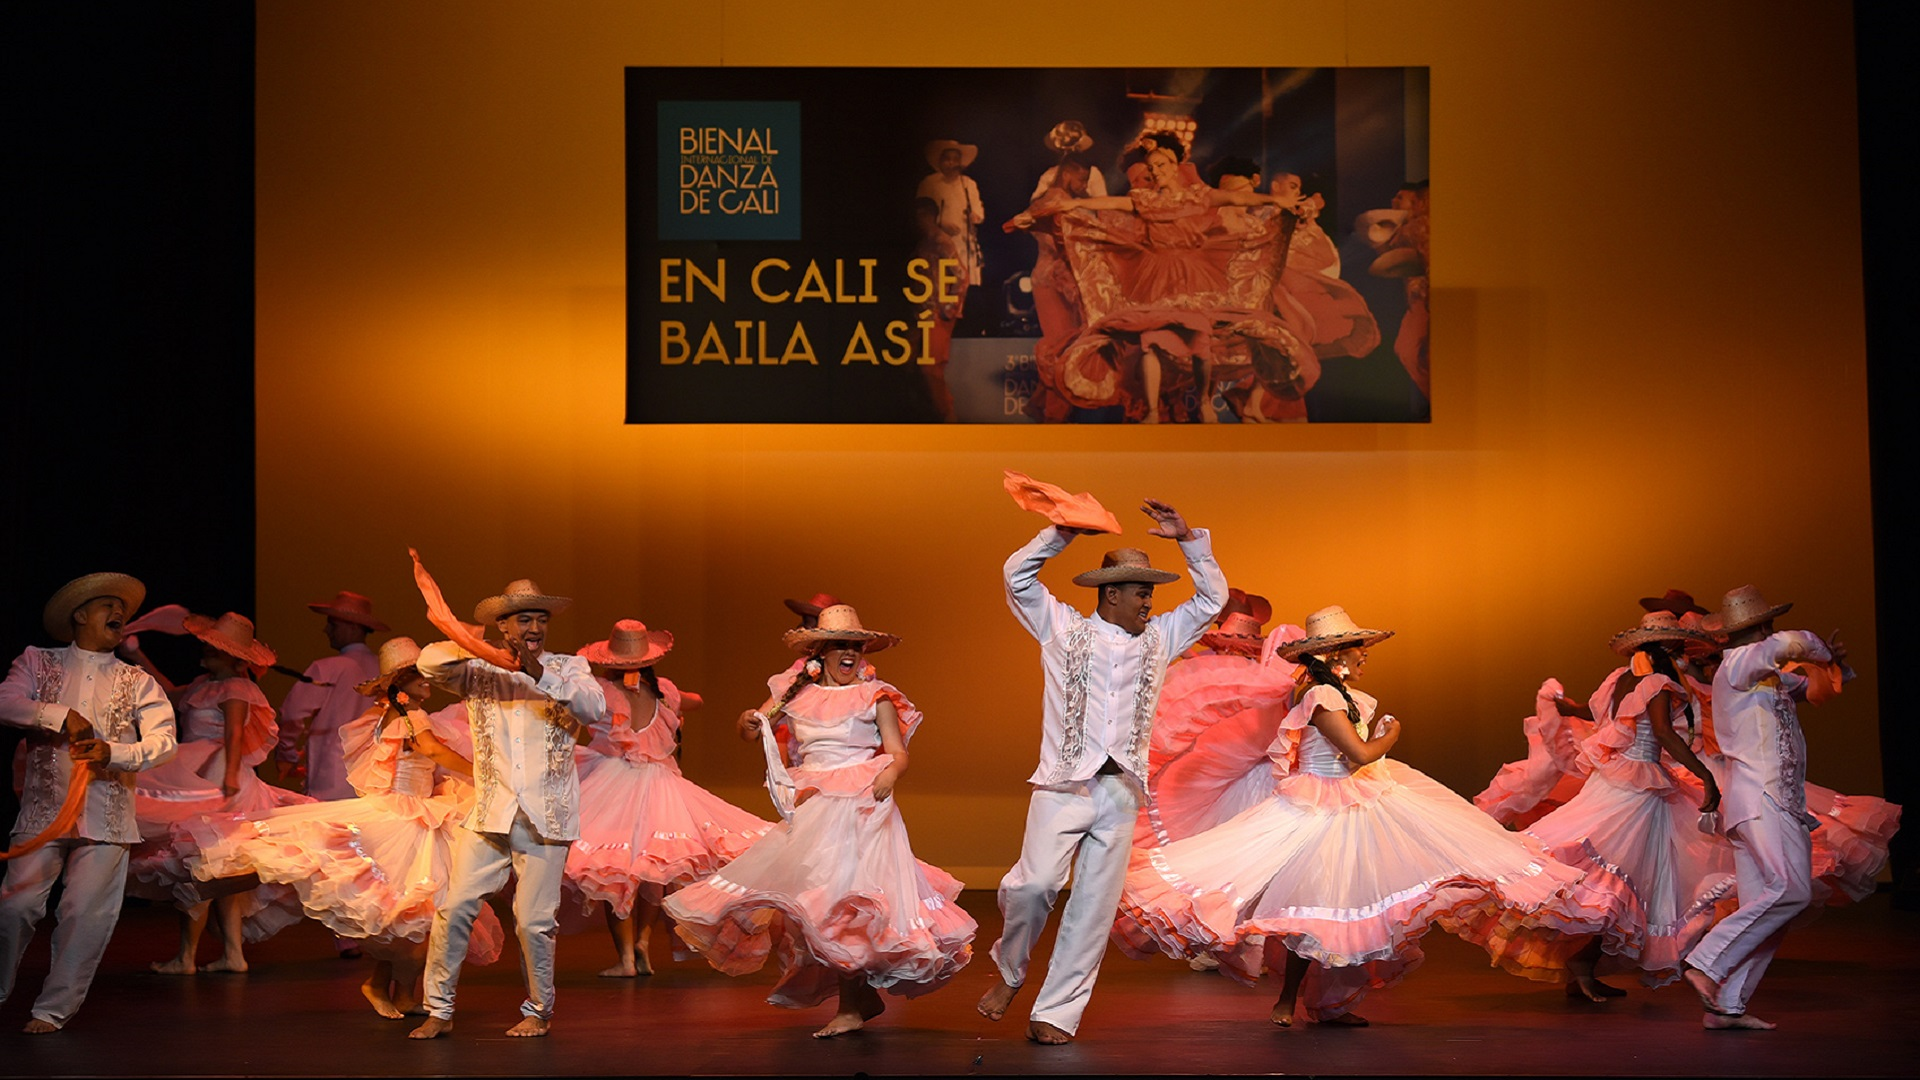 Cuarta Bienal de danza de Cali